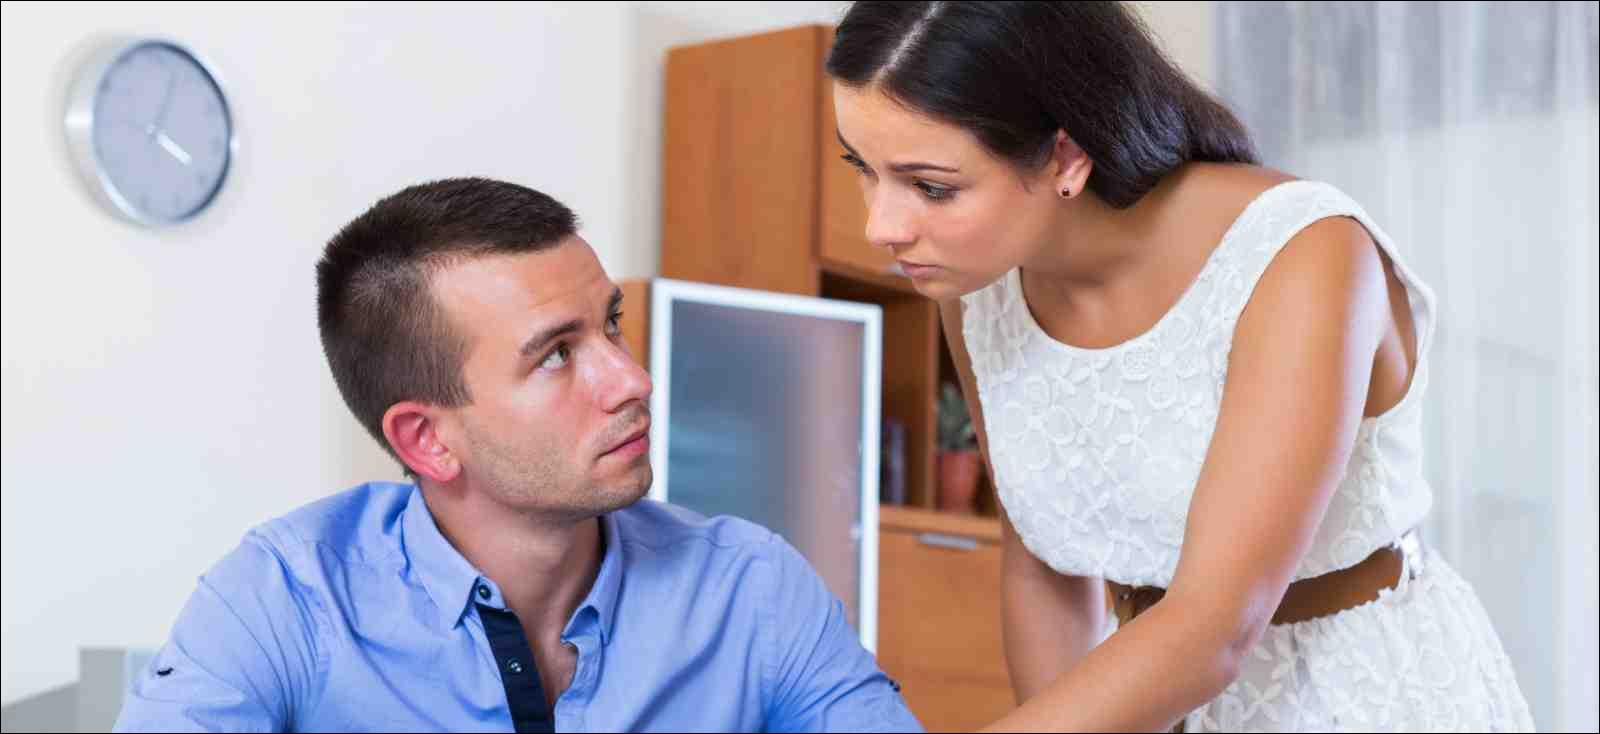 Irritated couple having serious conversation